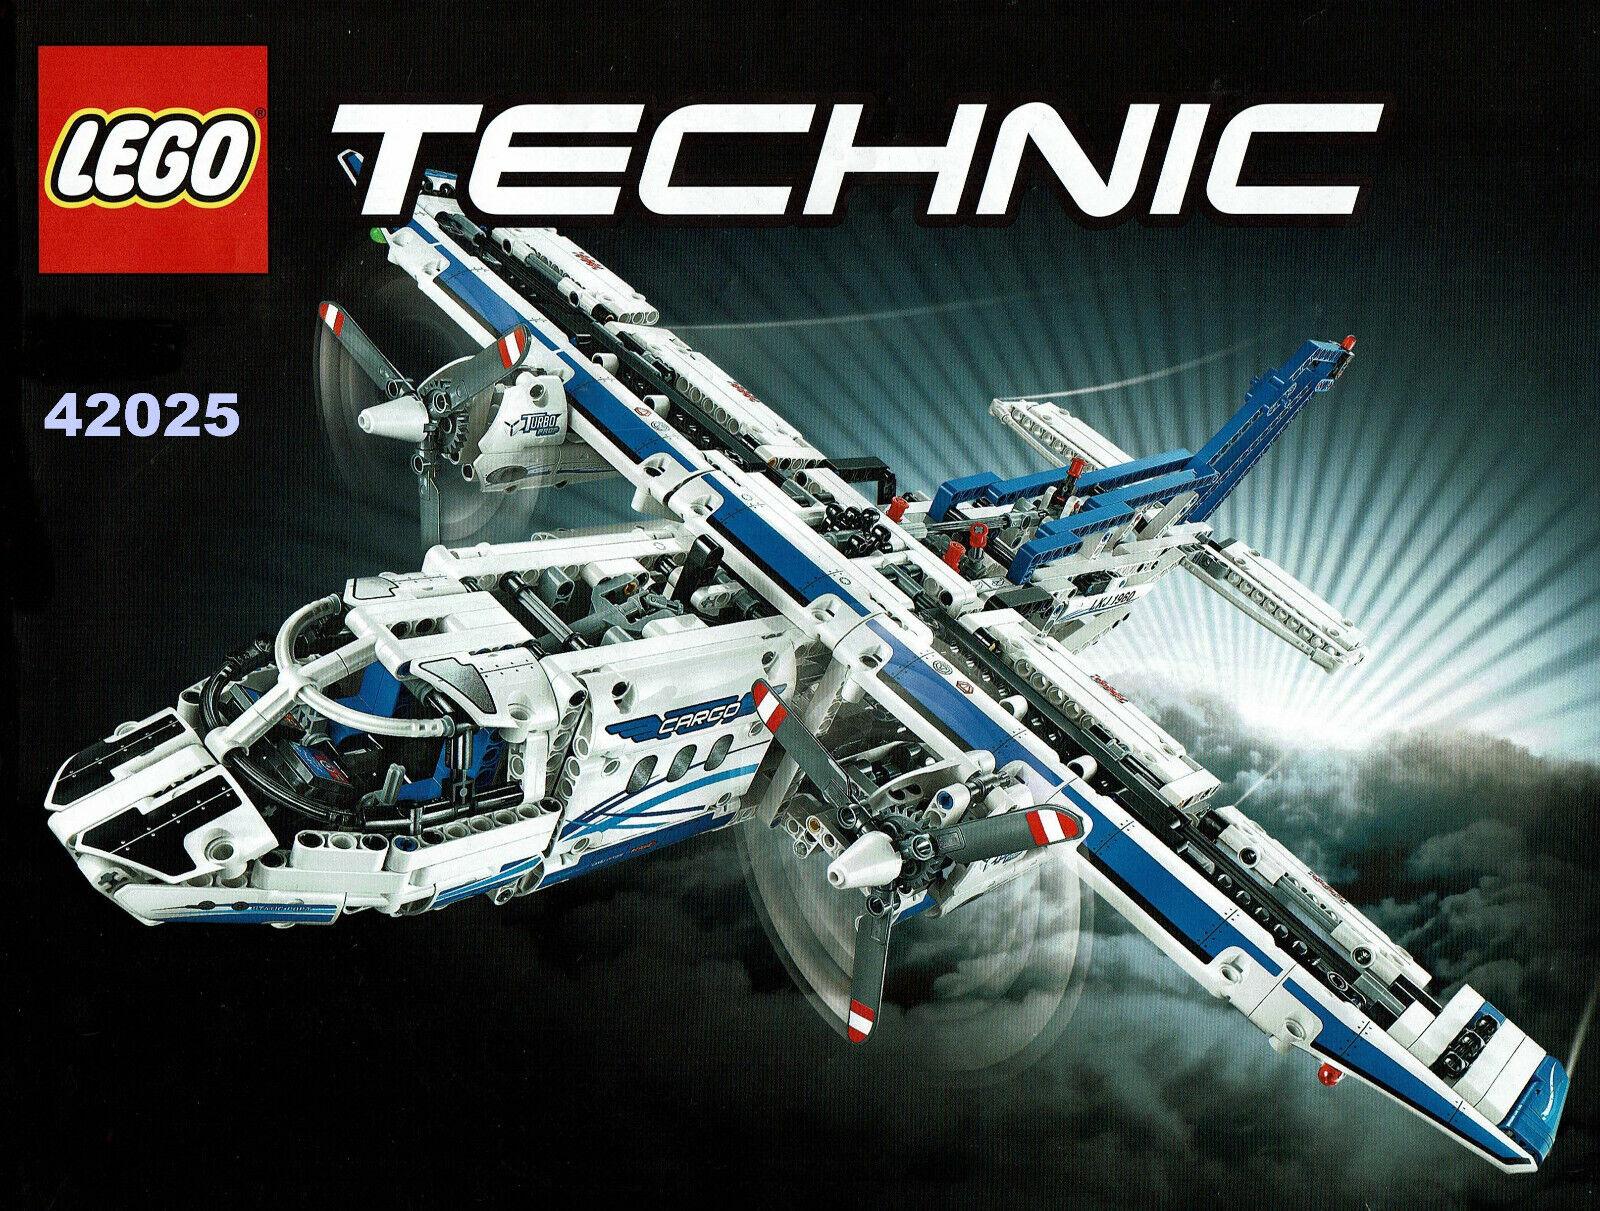 LEGO Technic 42025  Frachtflugzeug Top Modell 100 % komplett mit Powerfunction